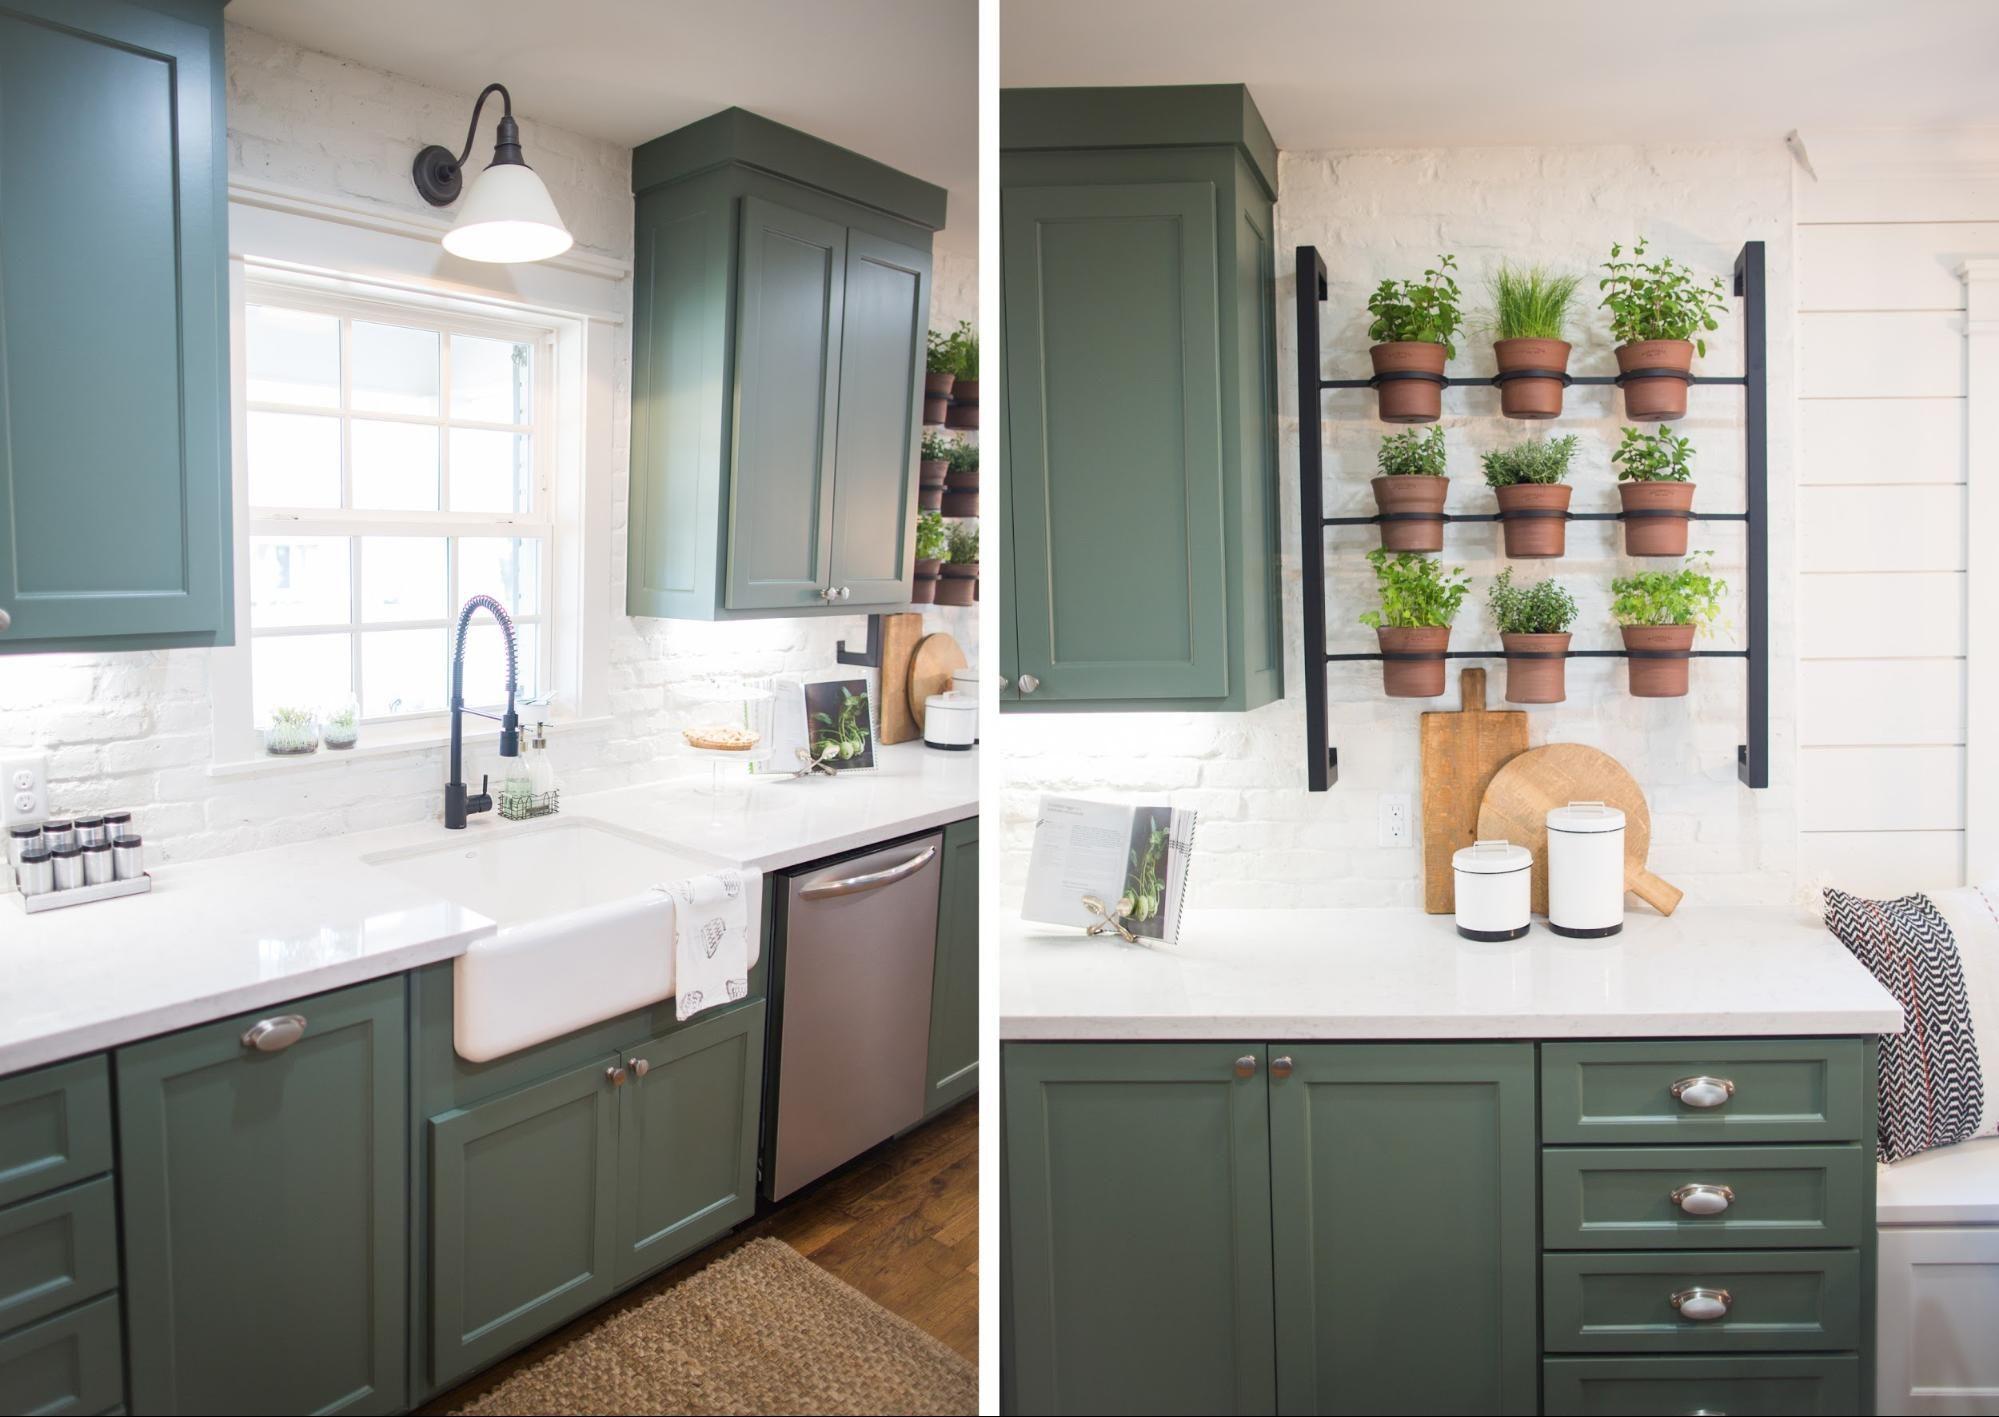 green cabinets fixer upper kitchen pinterest faucet sinks and kitchens on kitchen cabinets upper id=24587